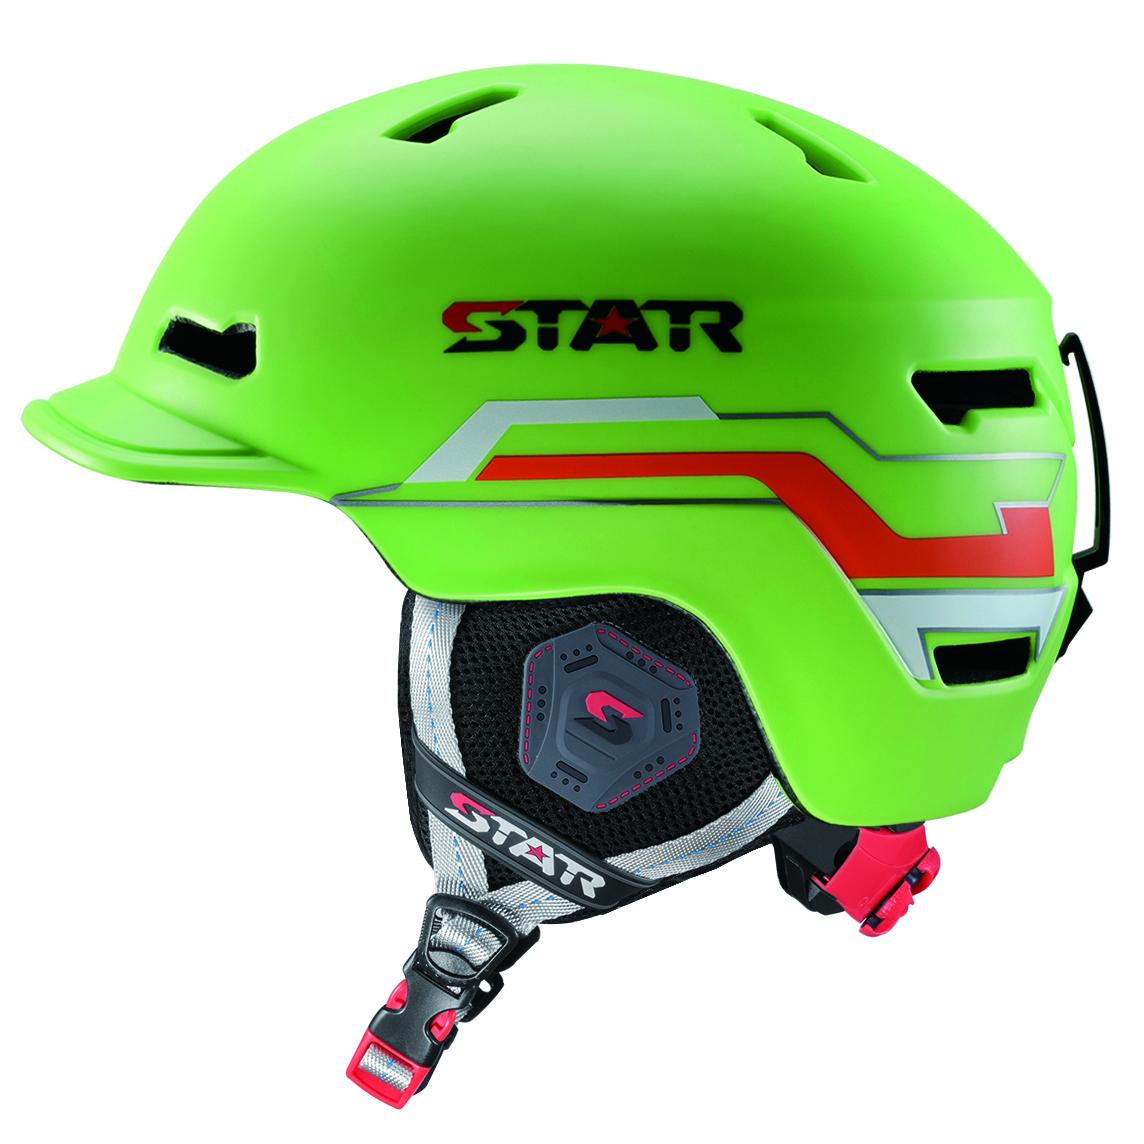 S3-10A Ski Helmet